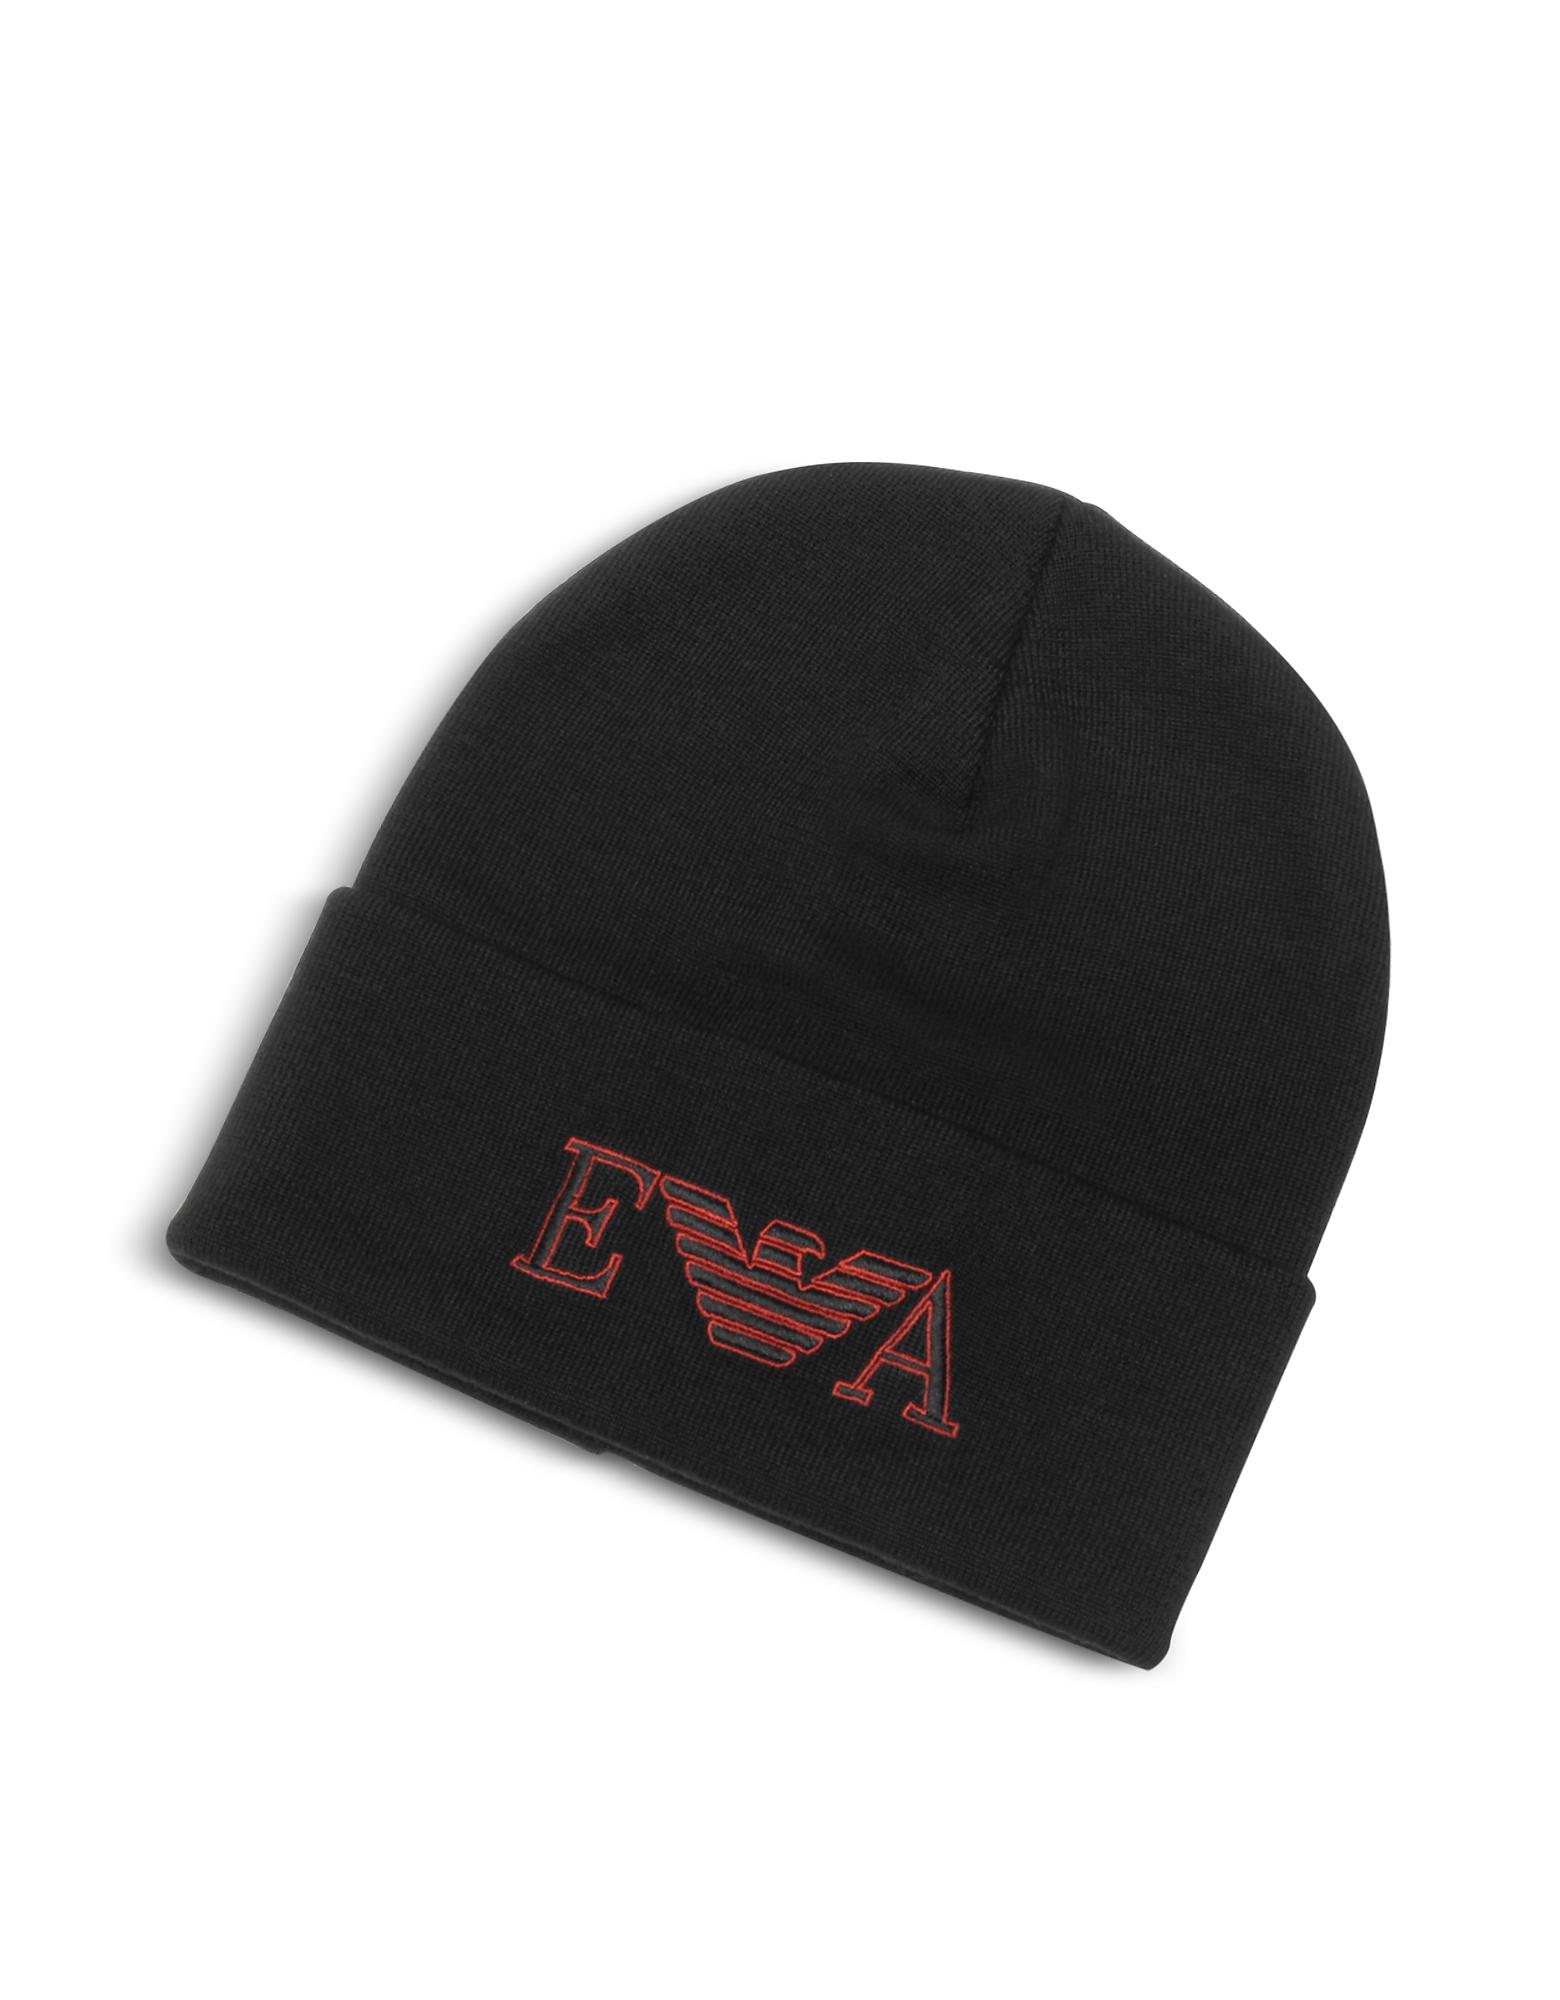 Emporio Armani Designer Men's Hats, Black EA Beanie Hat